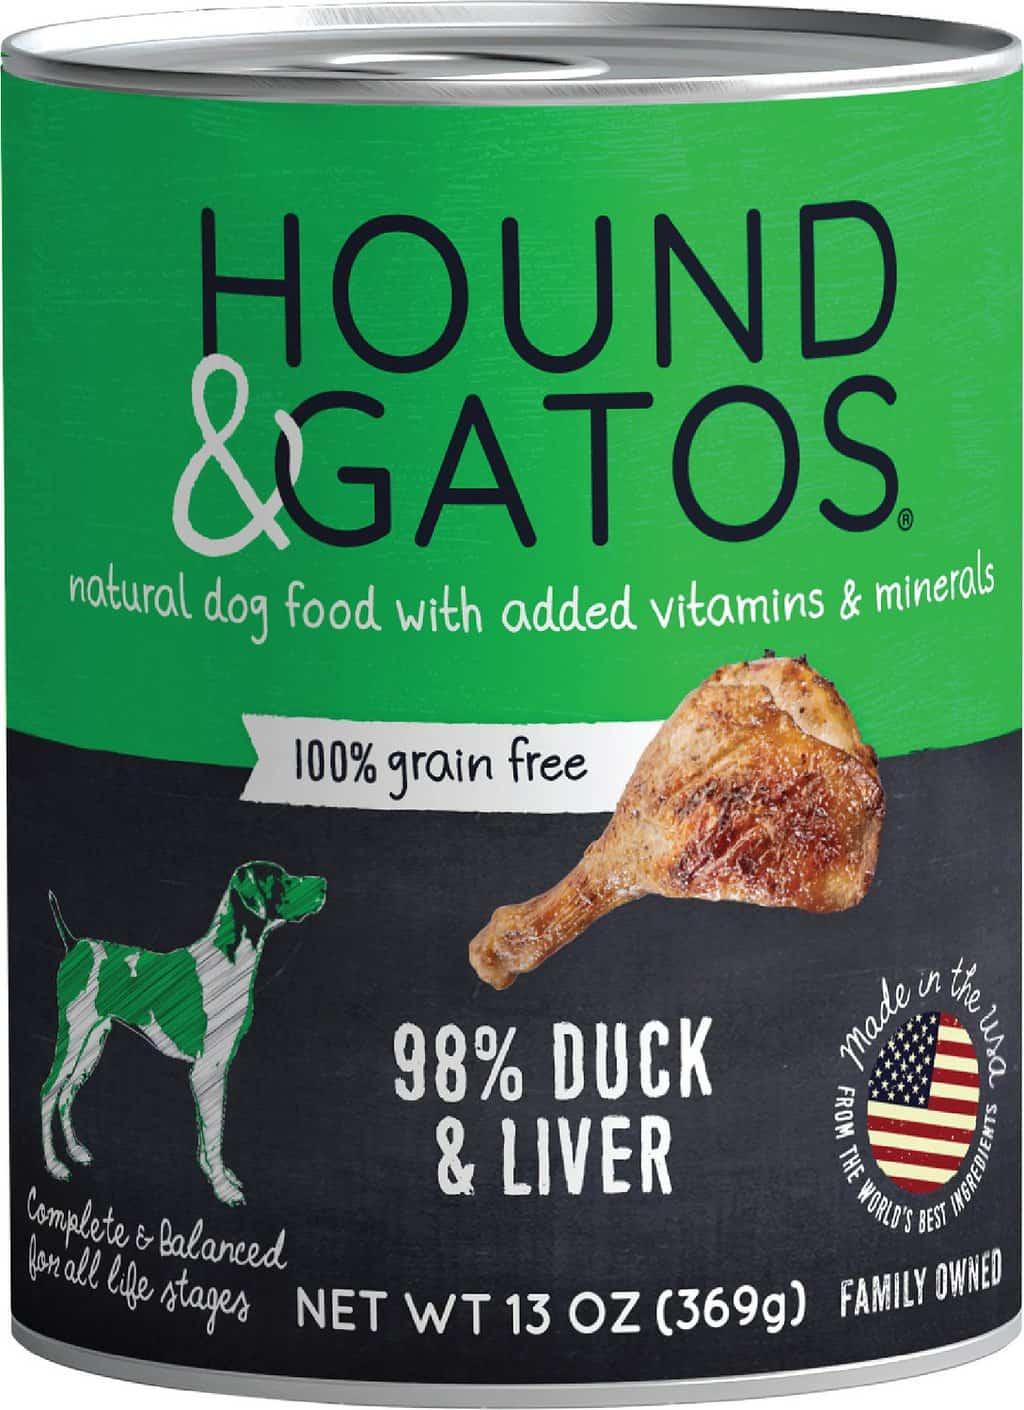 Hound and Gatos Dog Food Review, Recalls & Coupons [year] 20